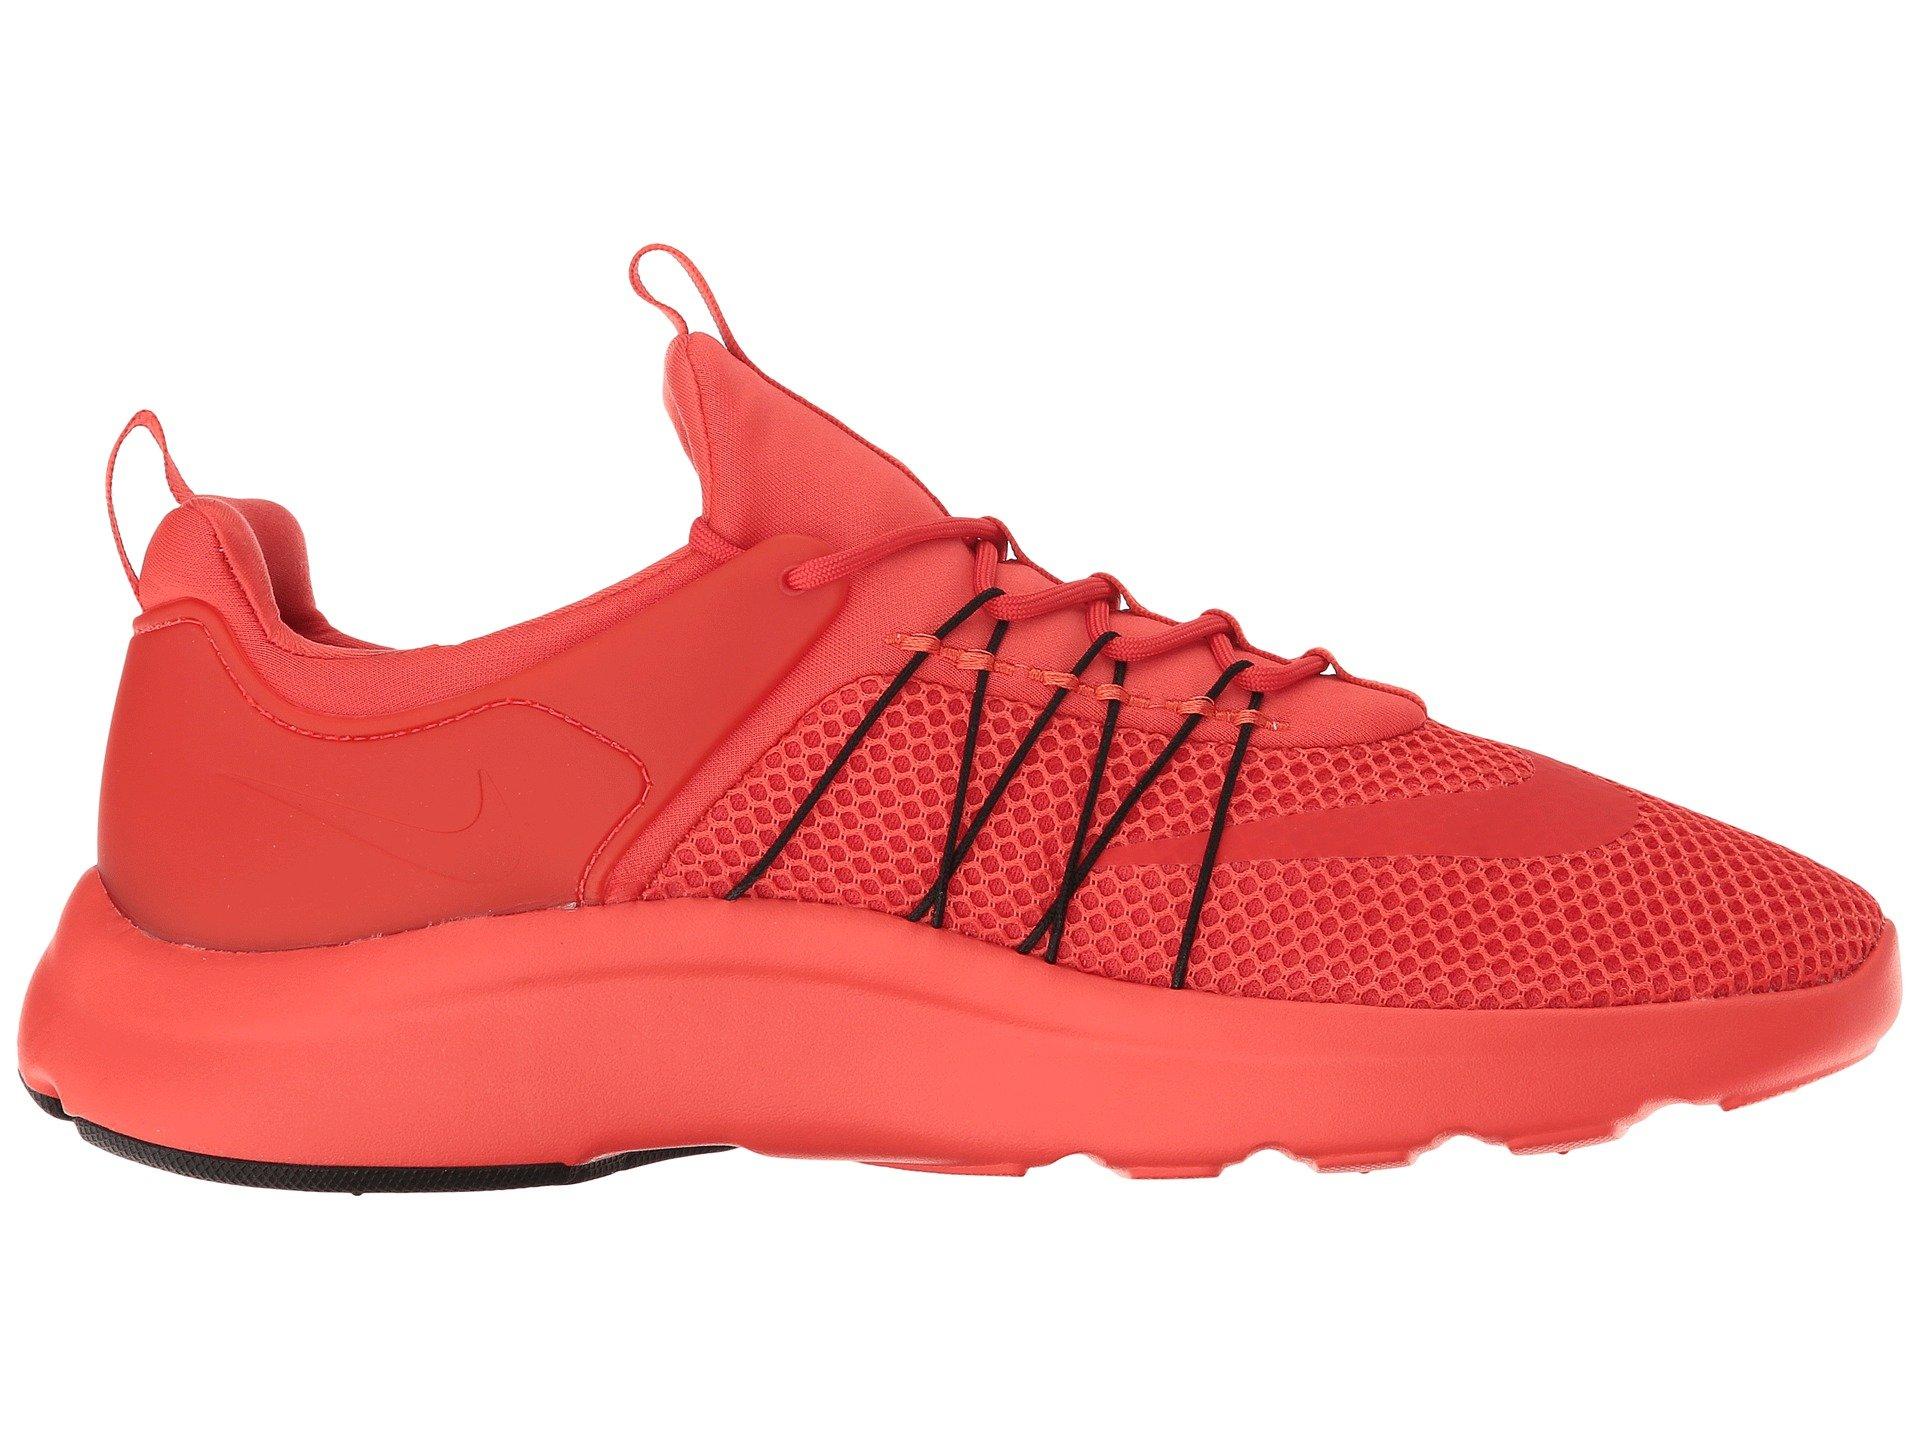 half off 1ae54 39478 ... nike darwin total orange coral on feet darwin shoes 2016 Video ...